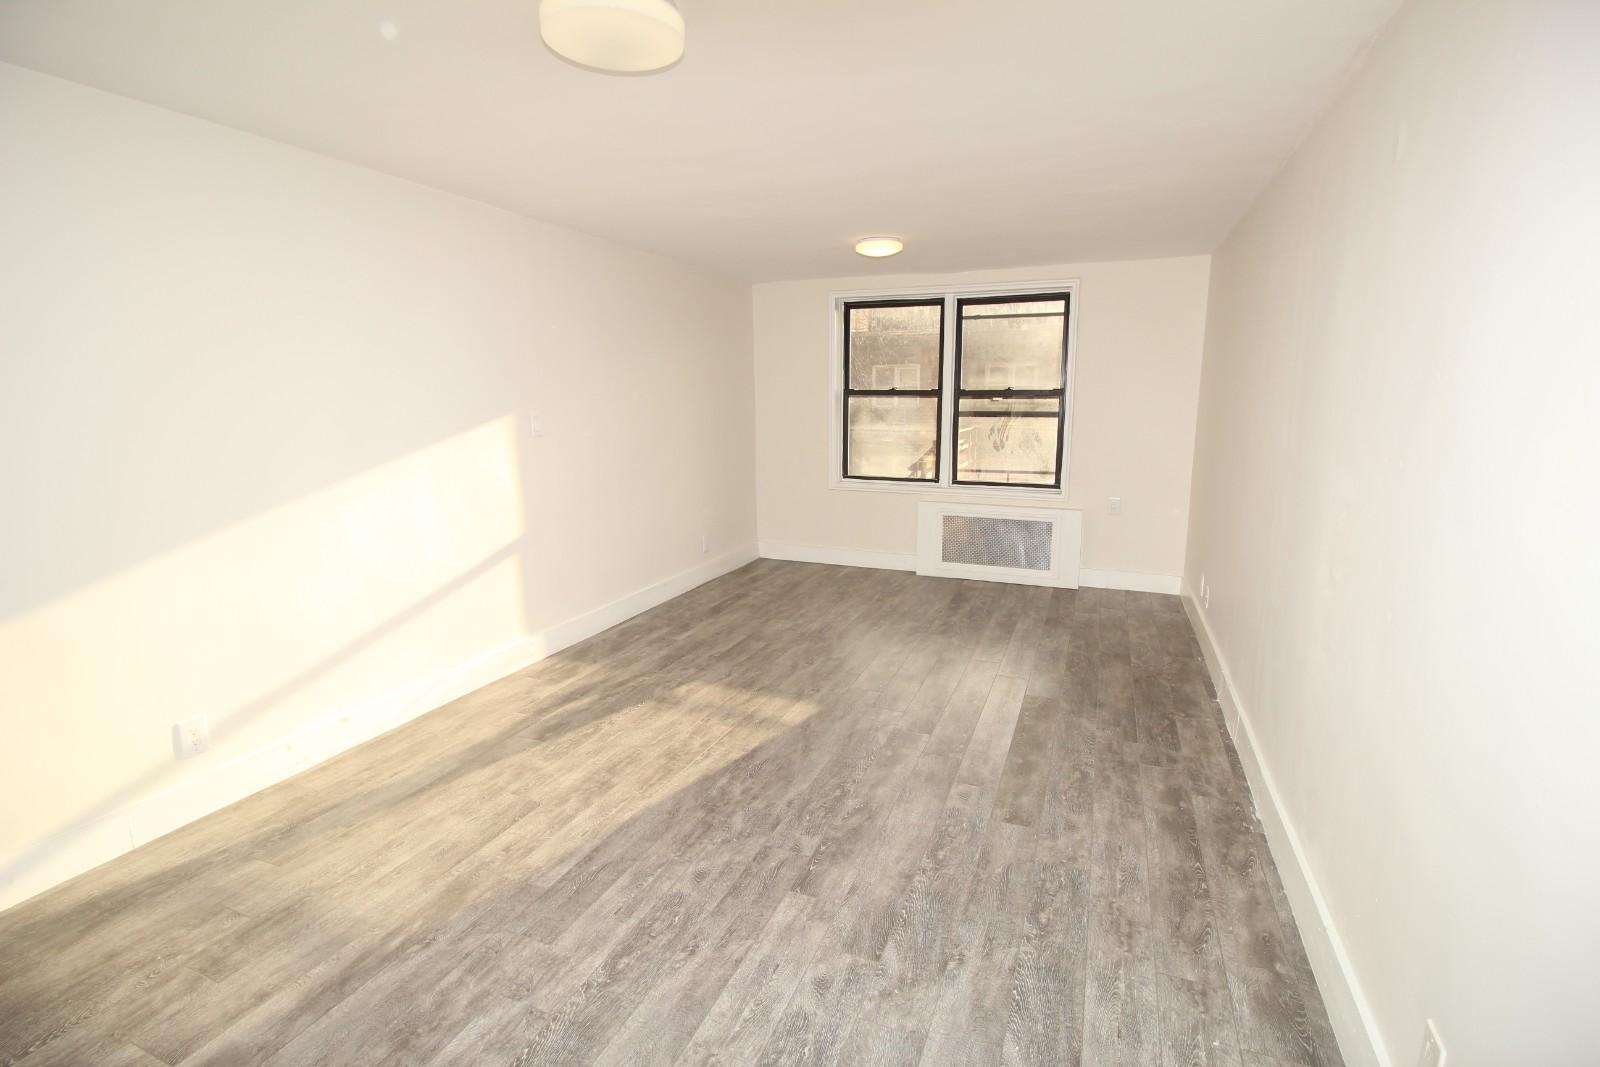 Corona Studio Apartment For Rent Denman Street Photo 1